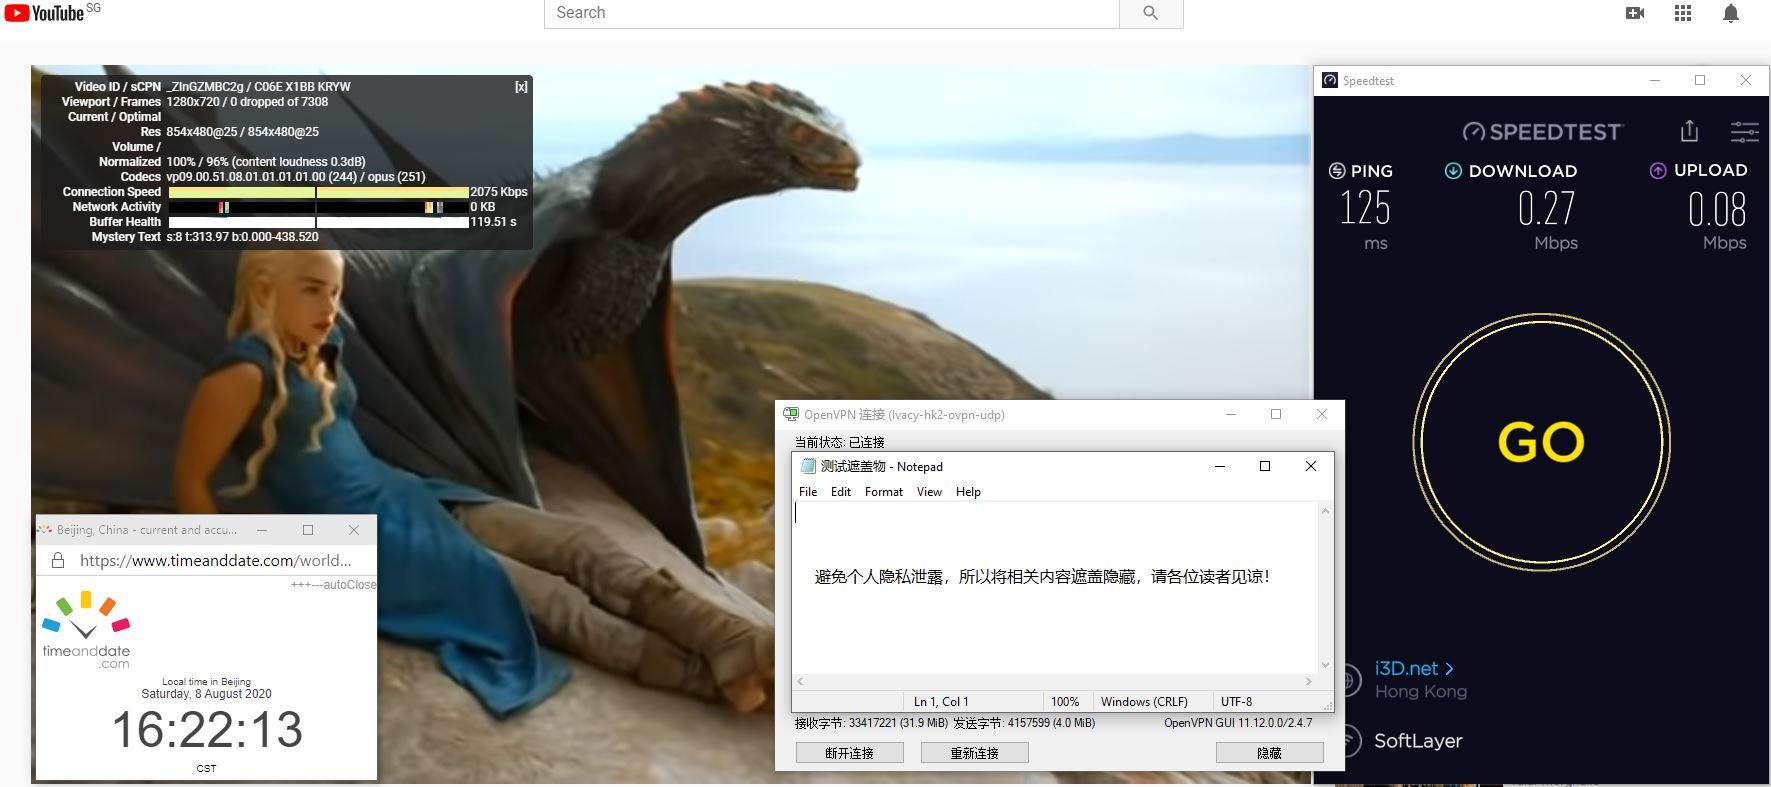 Windows10 IvacyVPN OpenVPN GUI hk2 中国VPN 翻墙 科学上网 翻墙速度测试 - 20200808